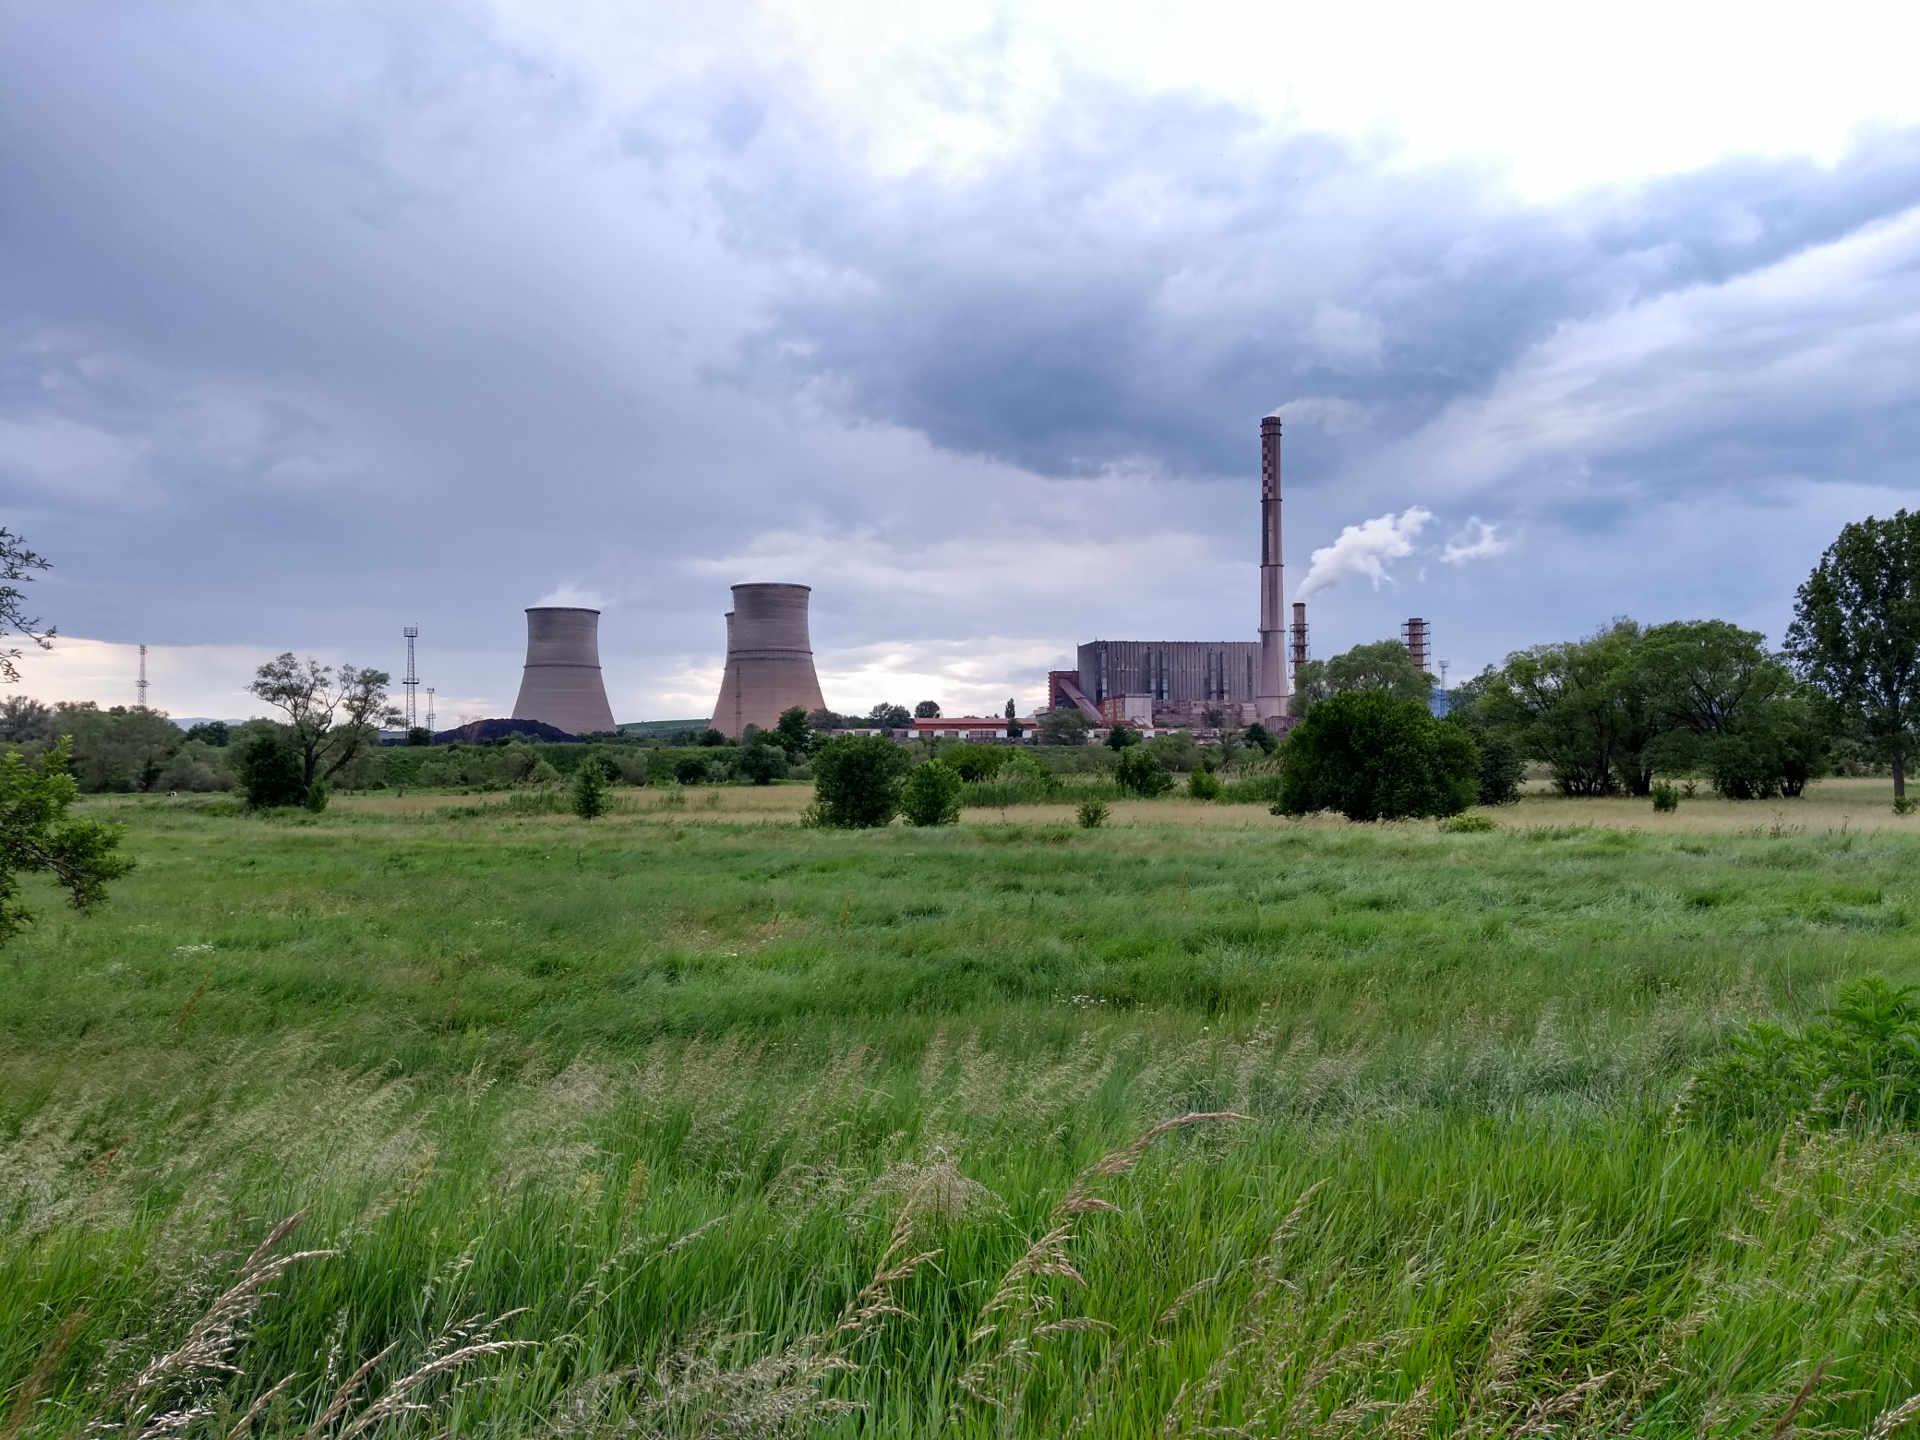 Kohleausstieg Bulgarien: Kraftwerk Bobov Dol.